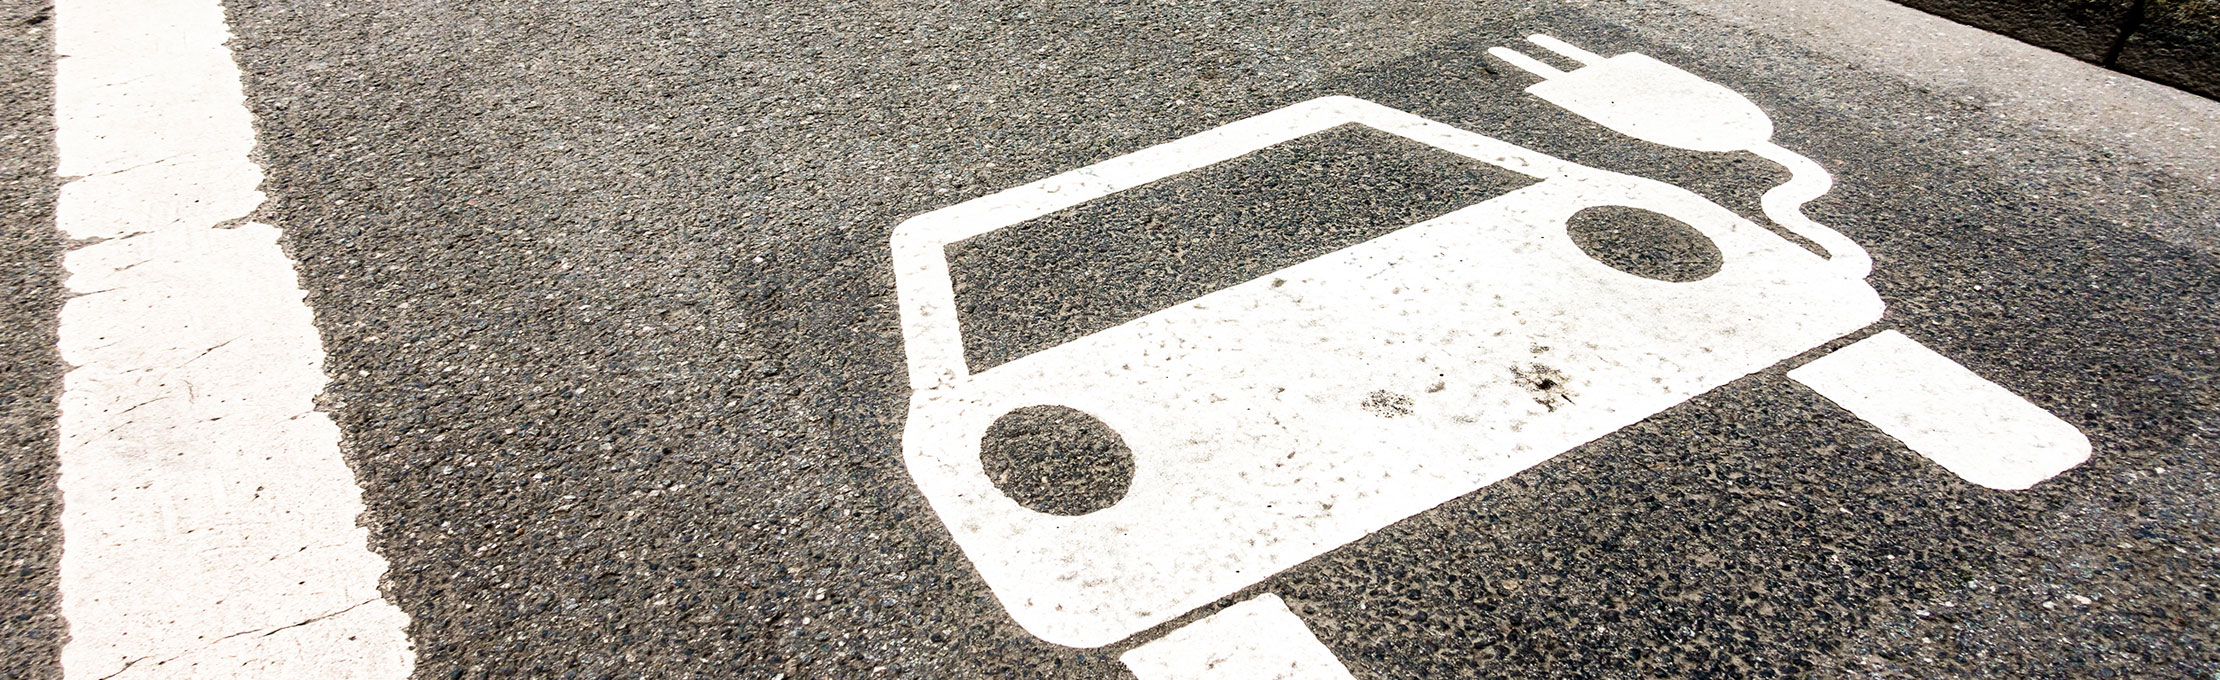 CPC Drive: Vehicle Salary Sacrifice Employee Benefit Scheme